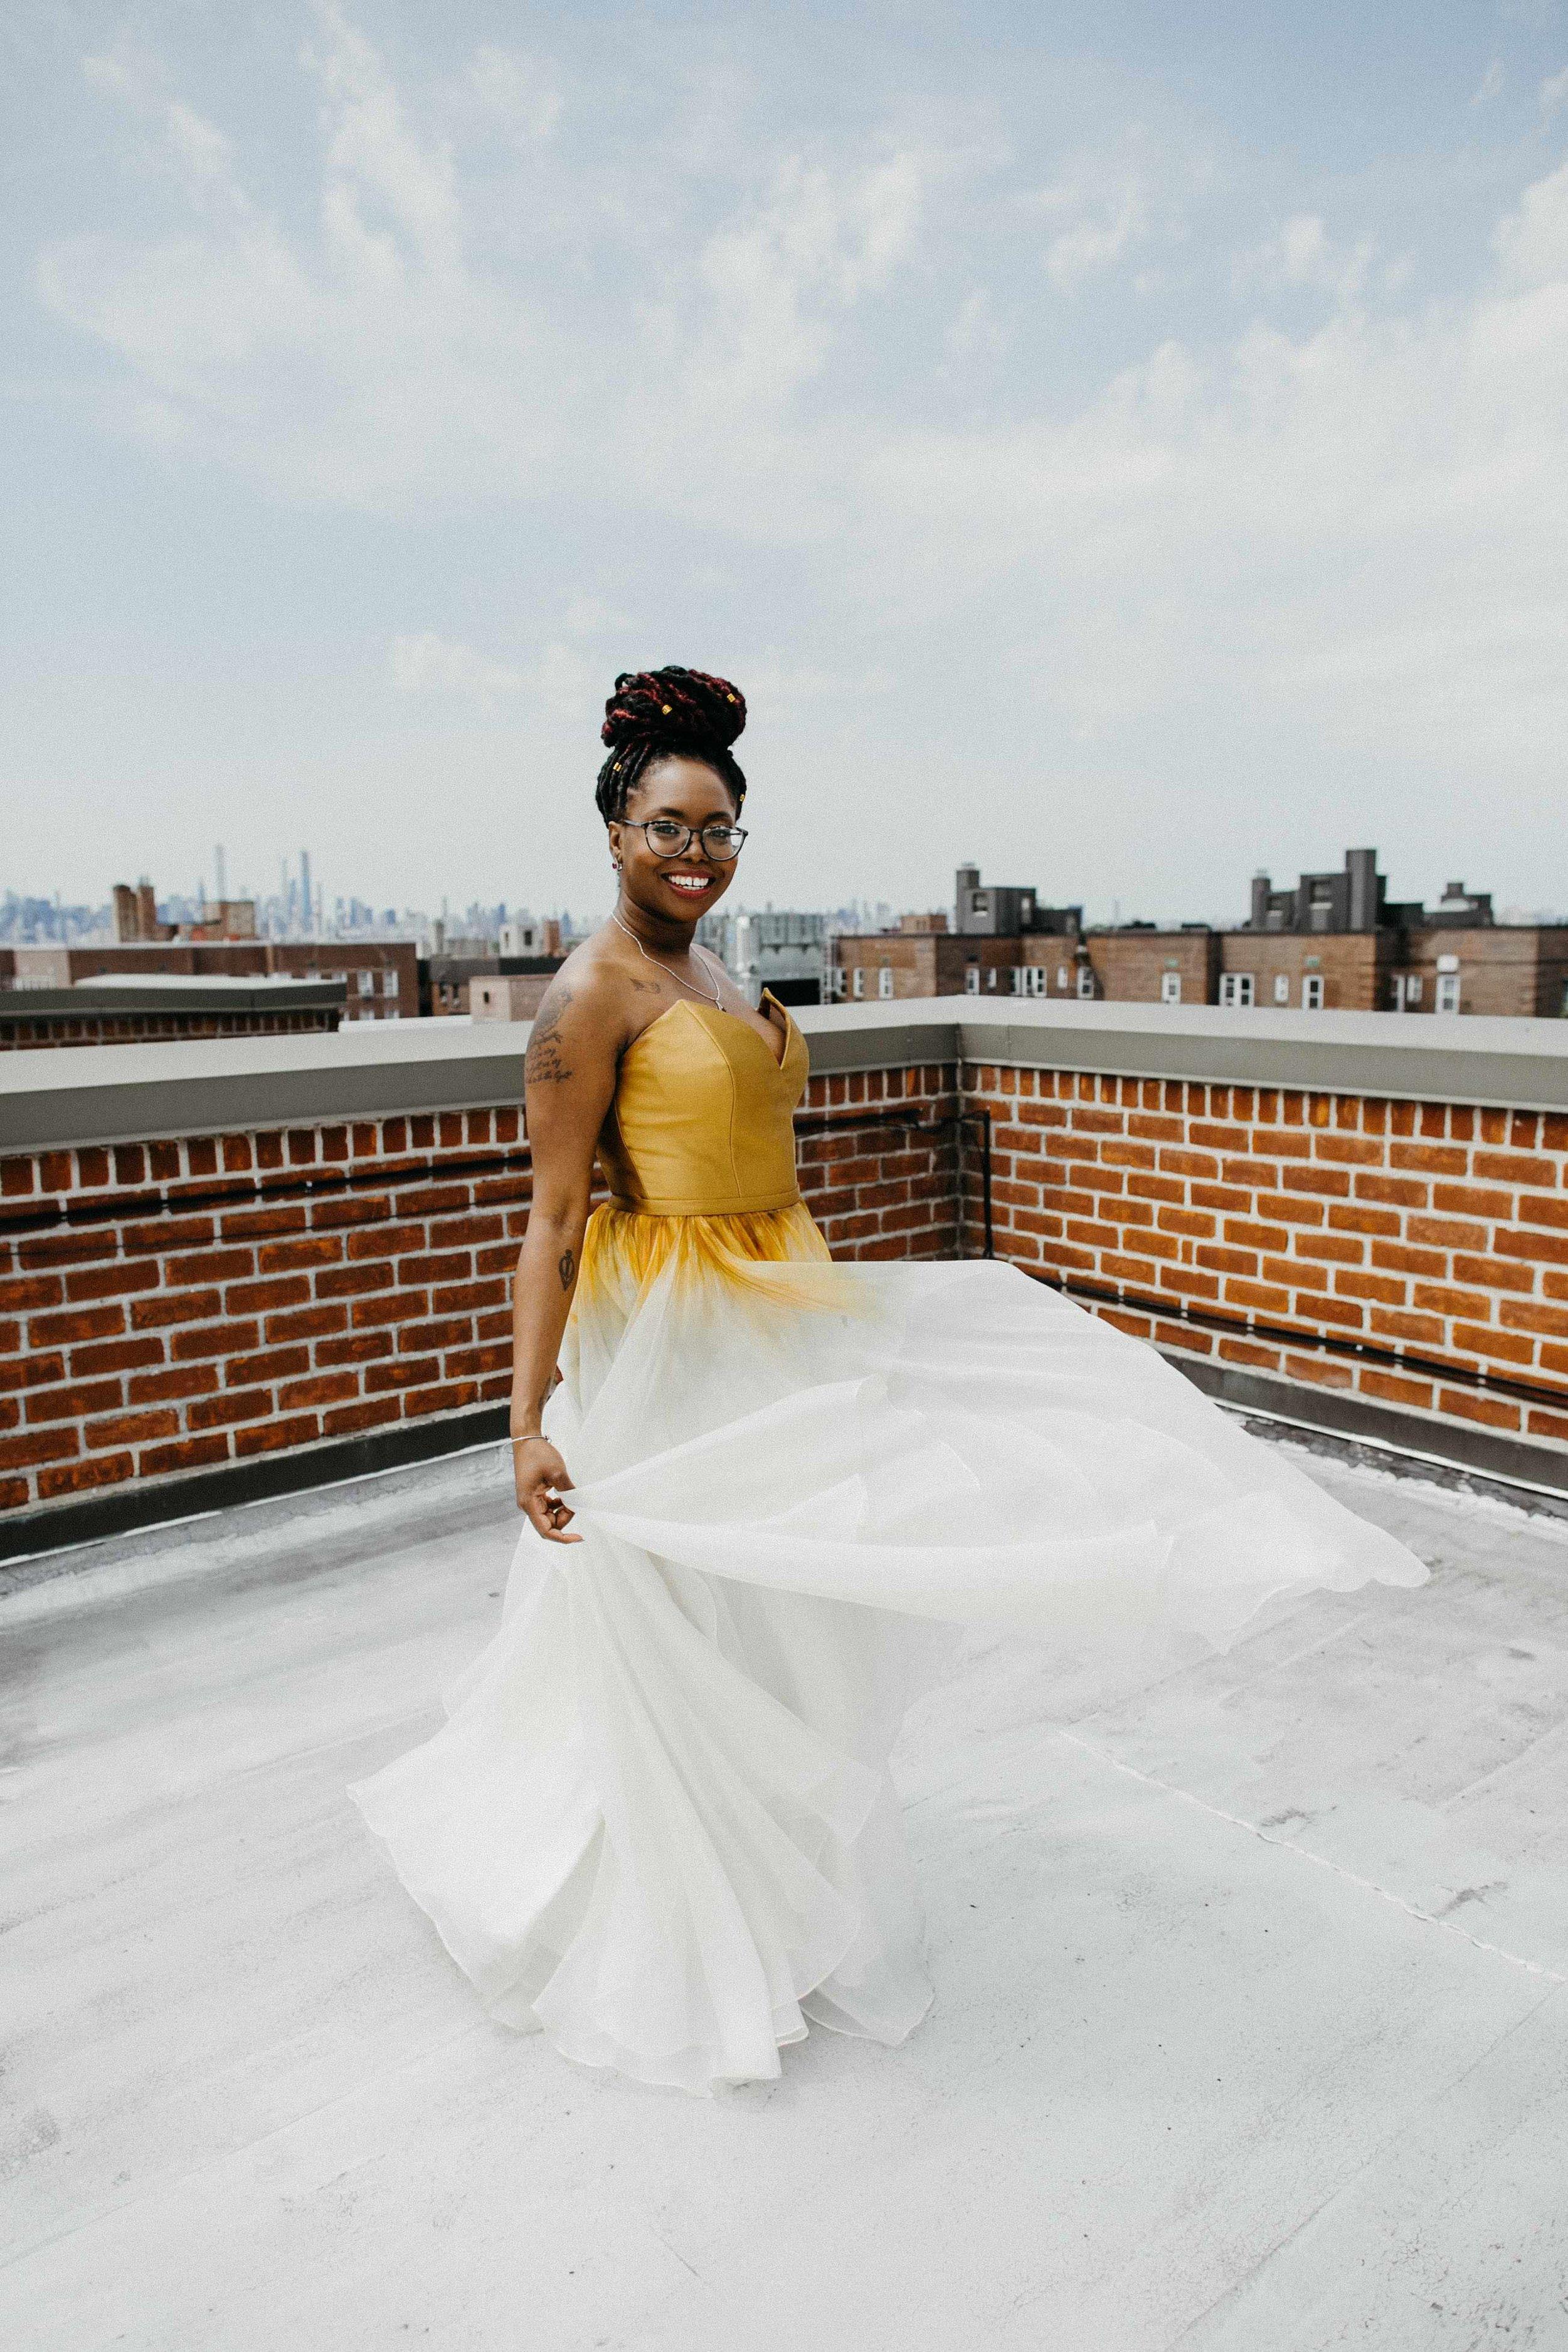 Sevlynn-Photography-Wedding-LIC-Landing-Maiella-NYC-9.jpg